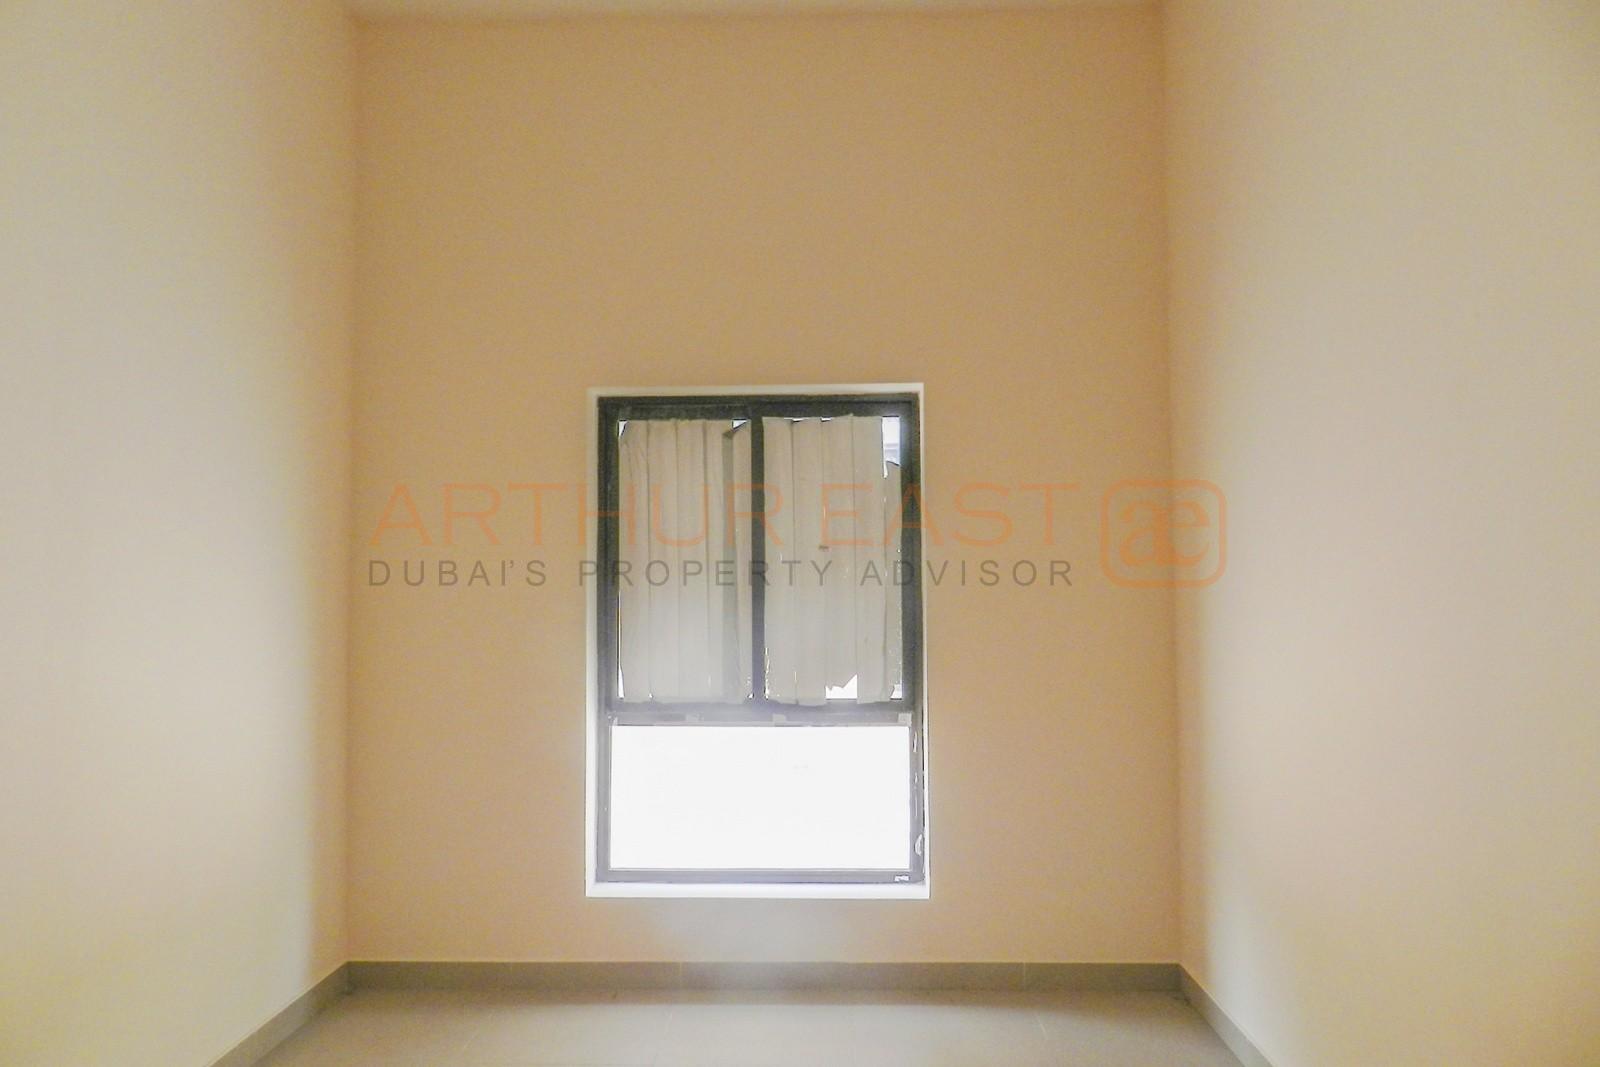 aed-3100-per-room-all-inclusive-labour-accommodation-in-sonapur